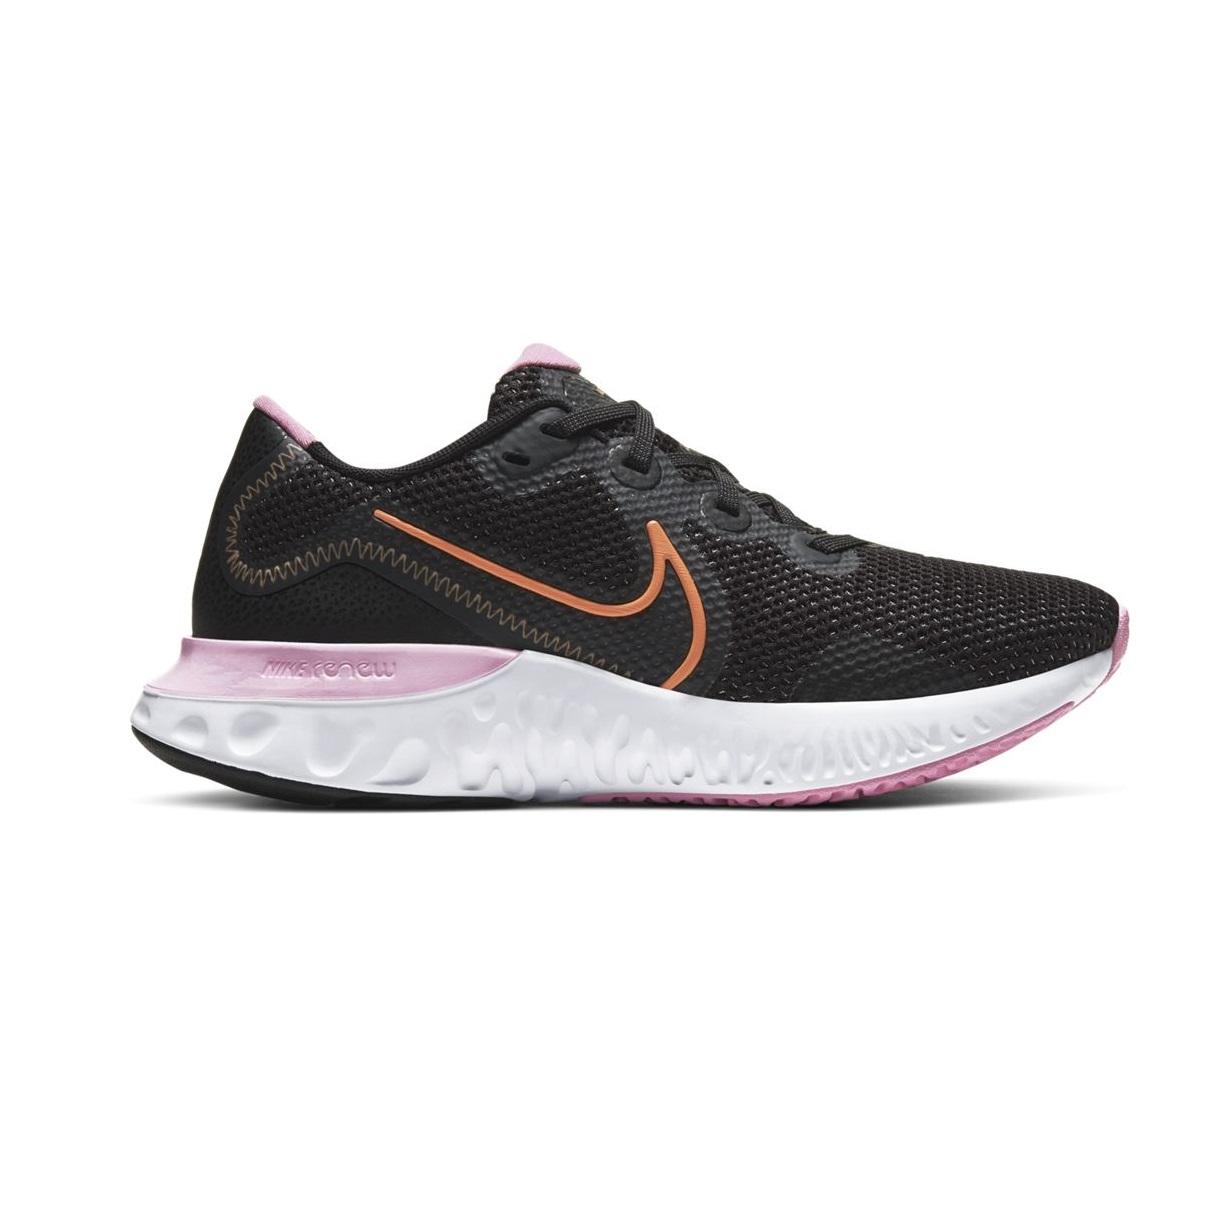 Extremo té el plastico  Zapatilla de running - Mujer - Nike Renew Run - CK6360-001   Ferre ...